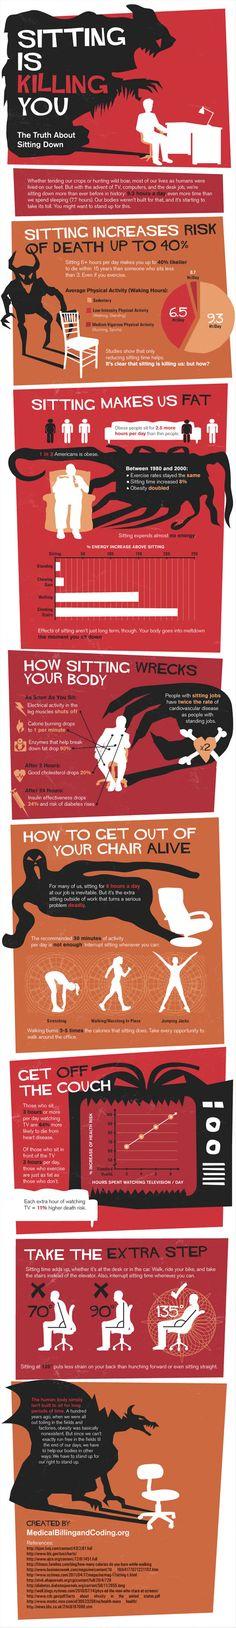 sitting infographic